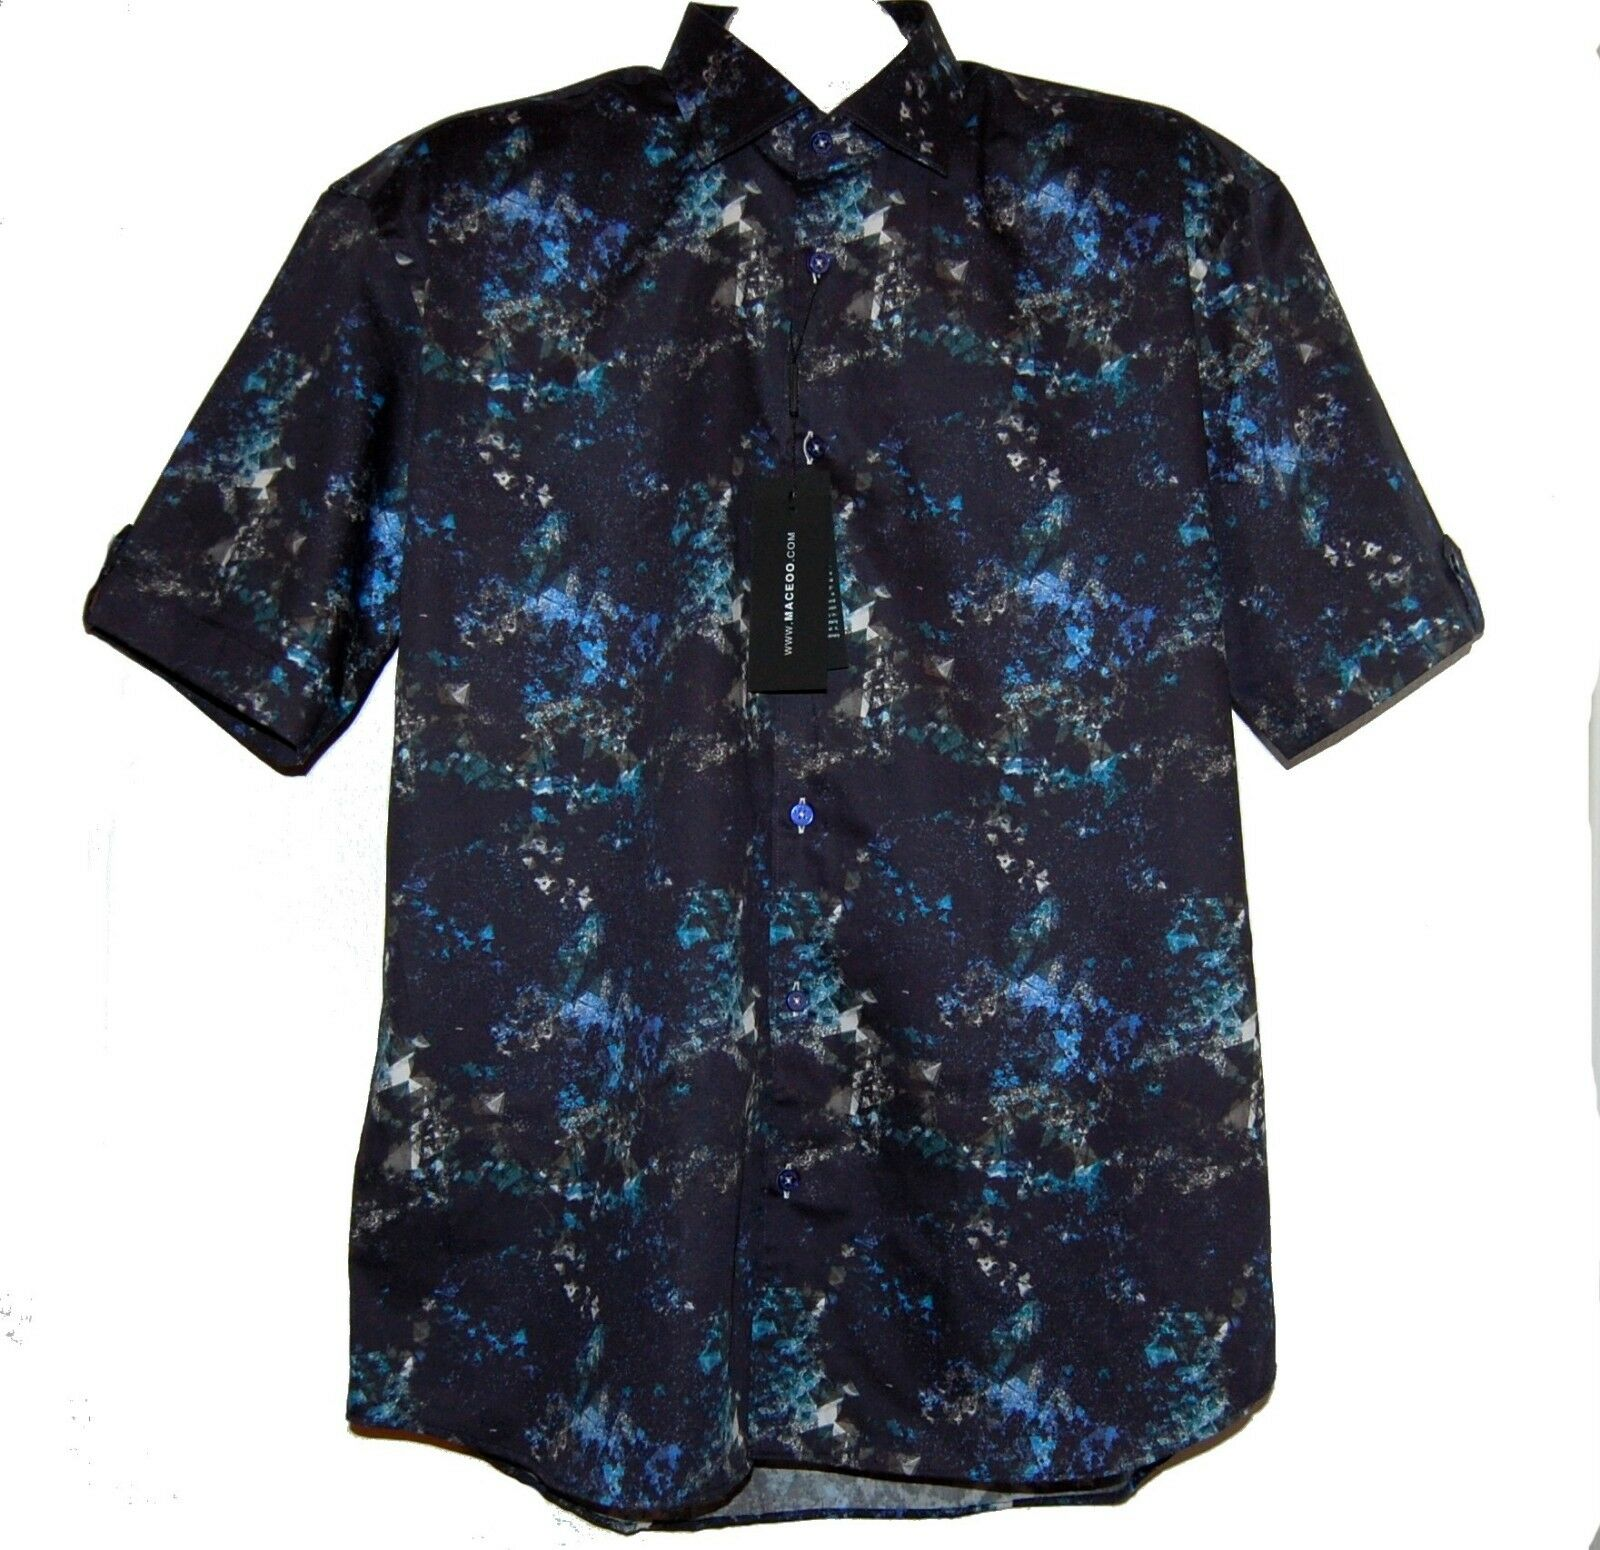 Maceoo Fresh PI bluee Italian Fabrics Cotton Men's Shirt Sz 5 XL NEW